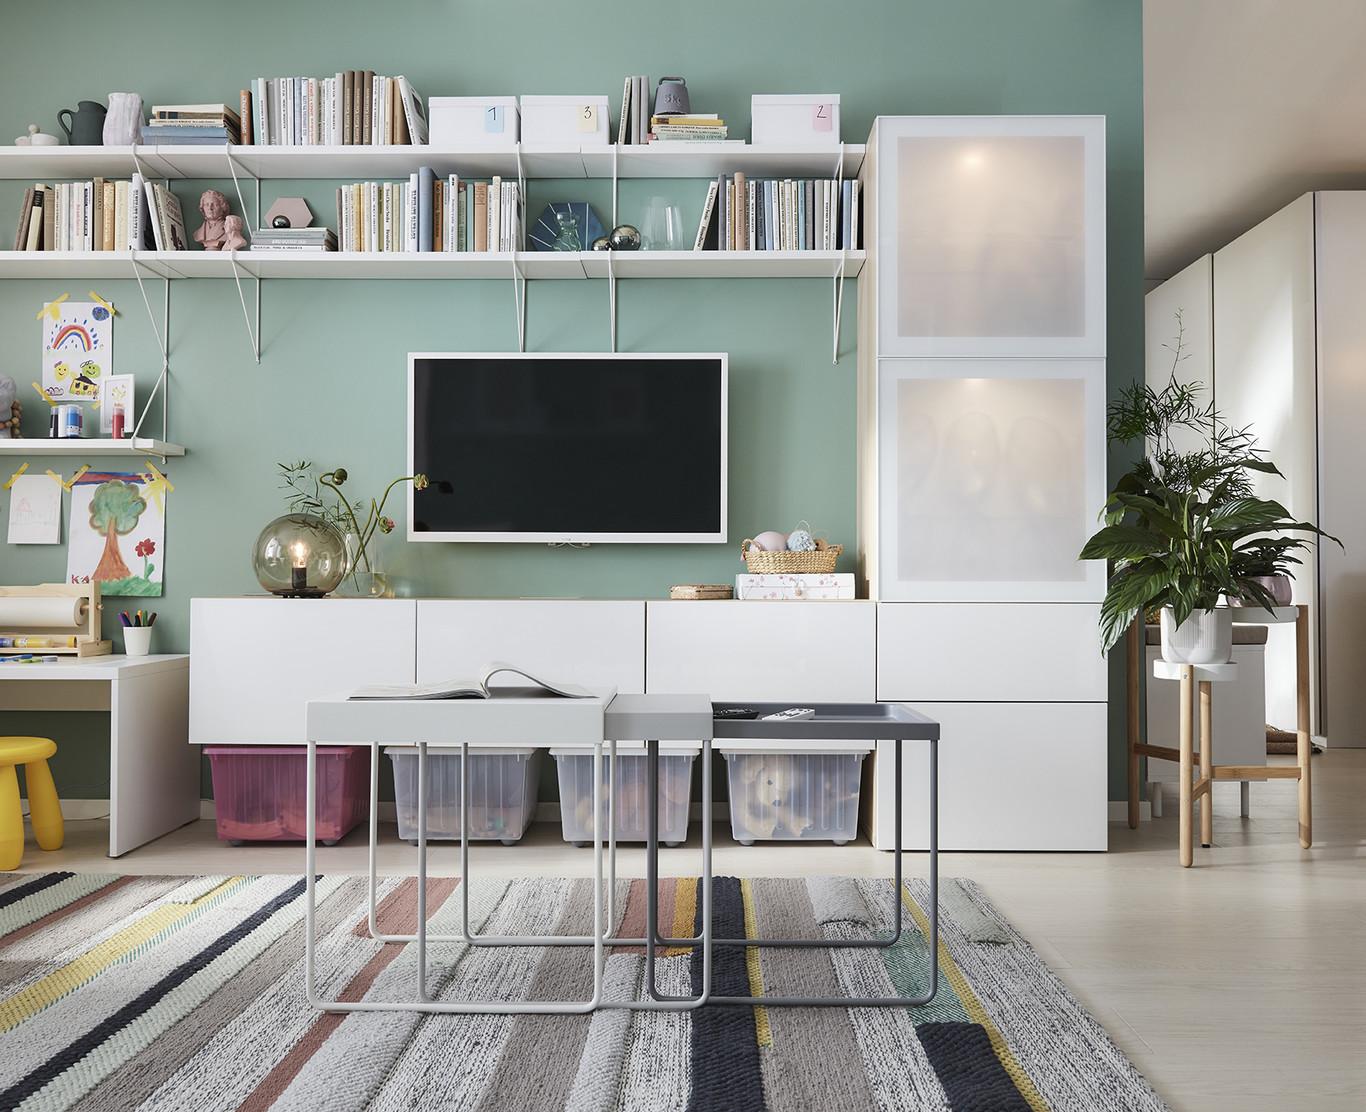 novedad catálogo ikea 2020 the lab home España salón verde claro con mueble salón blanco